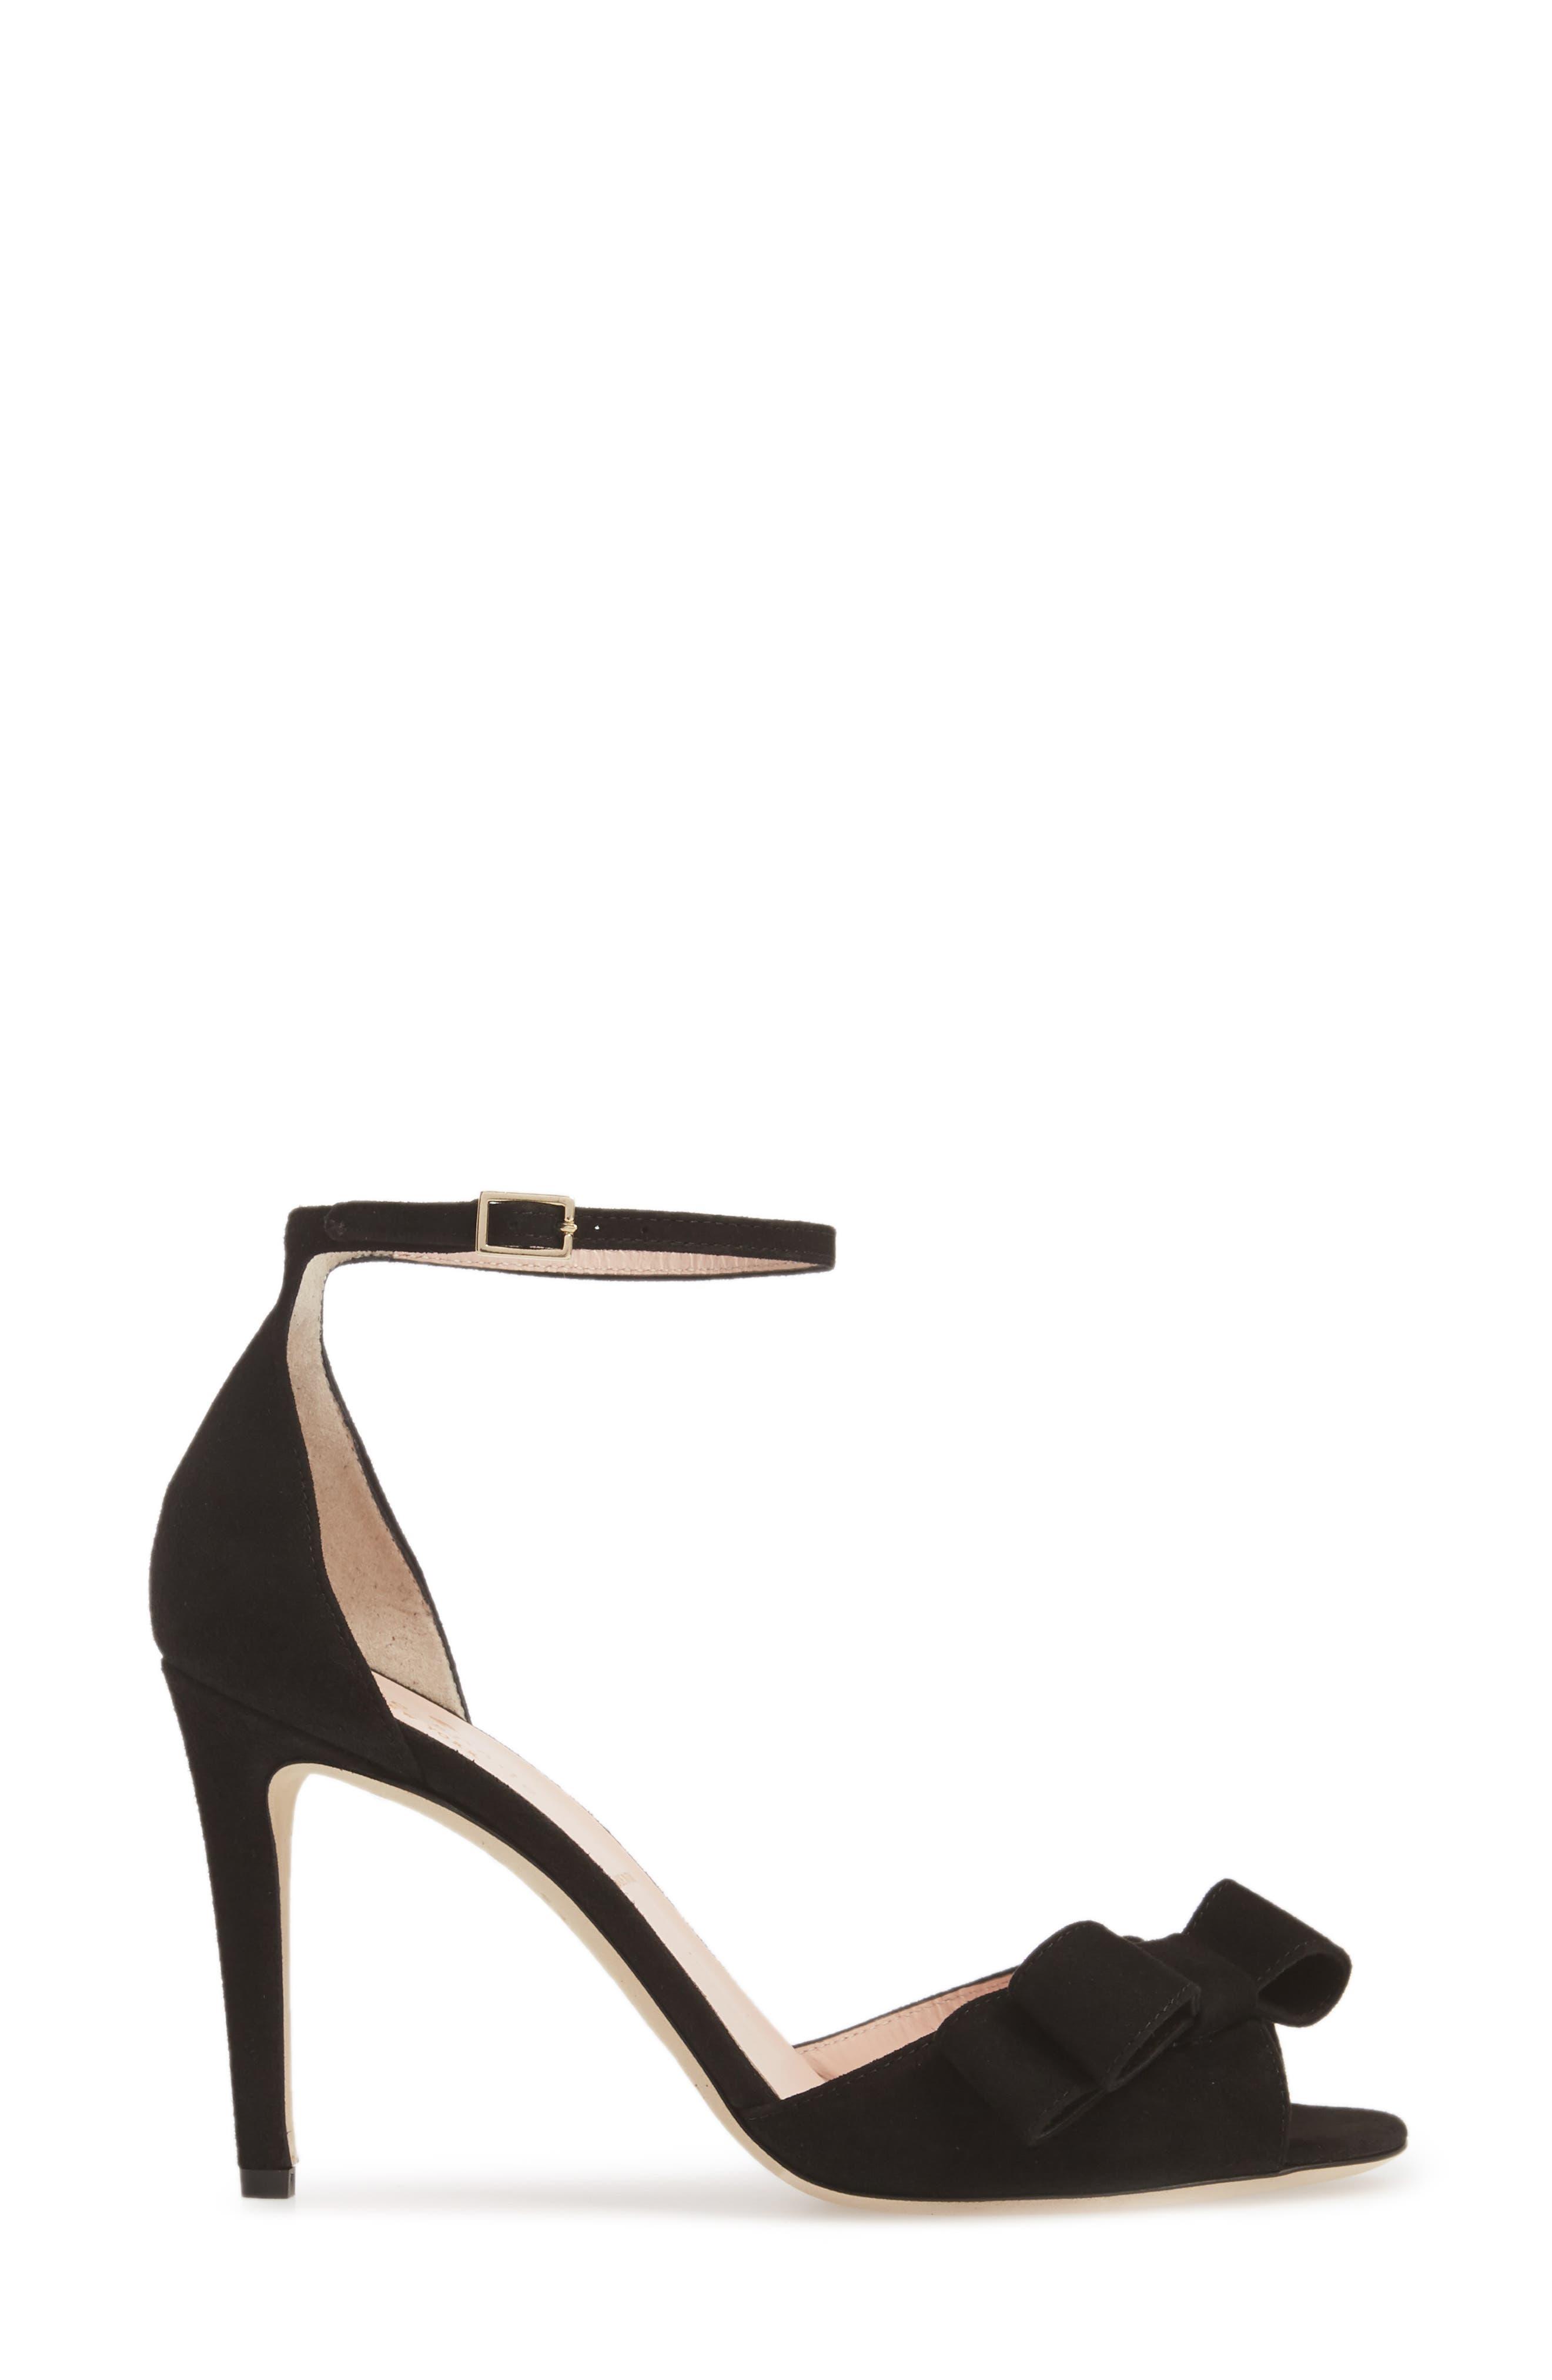 ismay ankle strap sandal,                             Alternate thumbnail 3, color,                             001